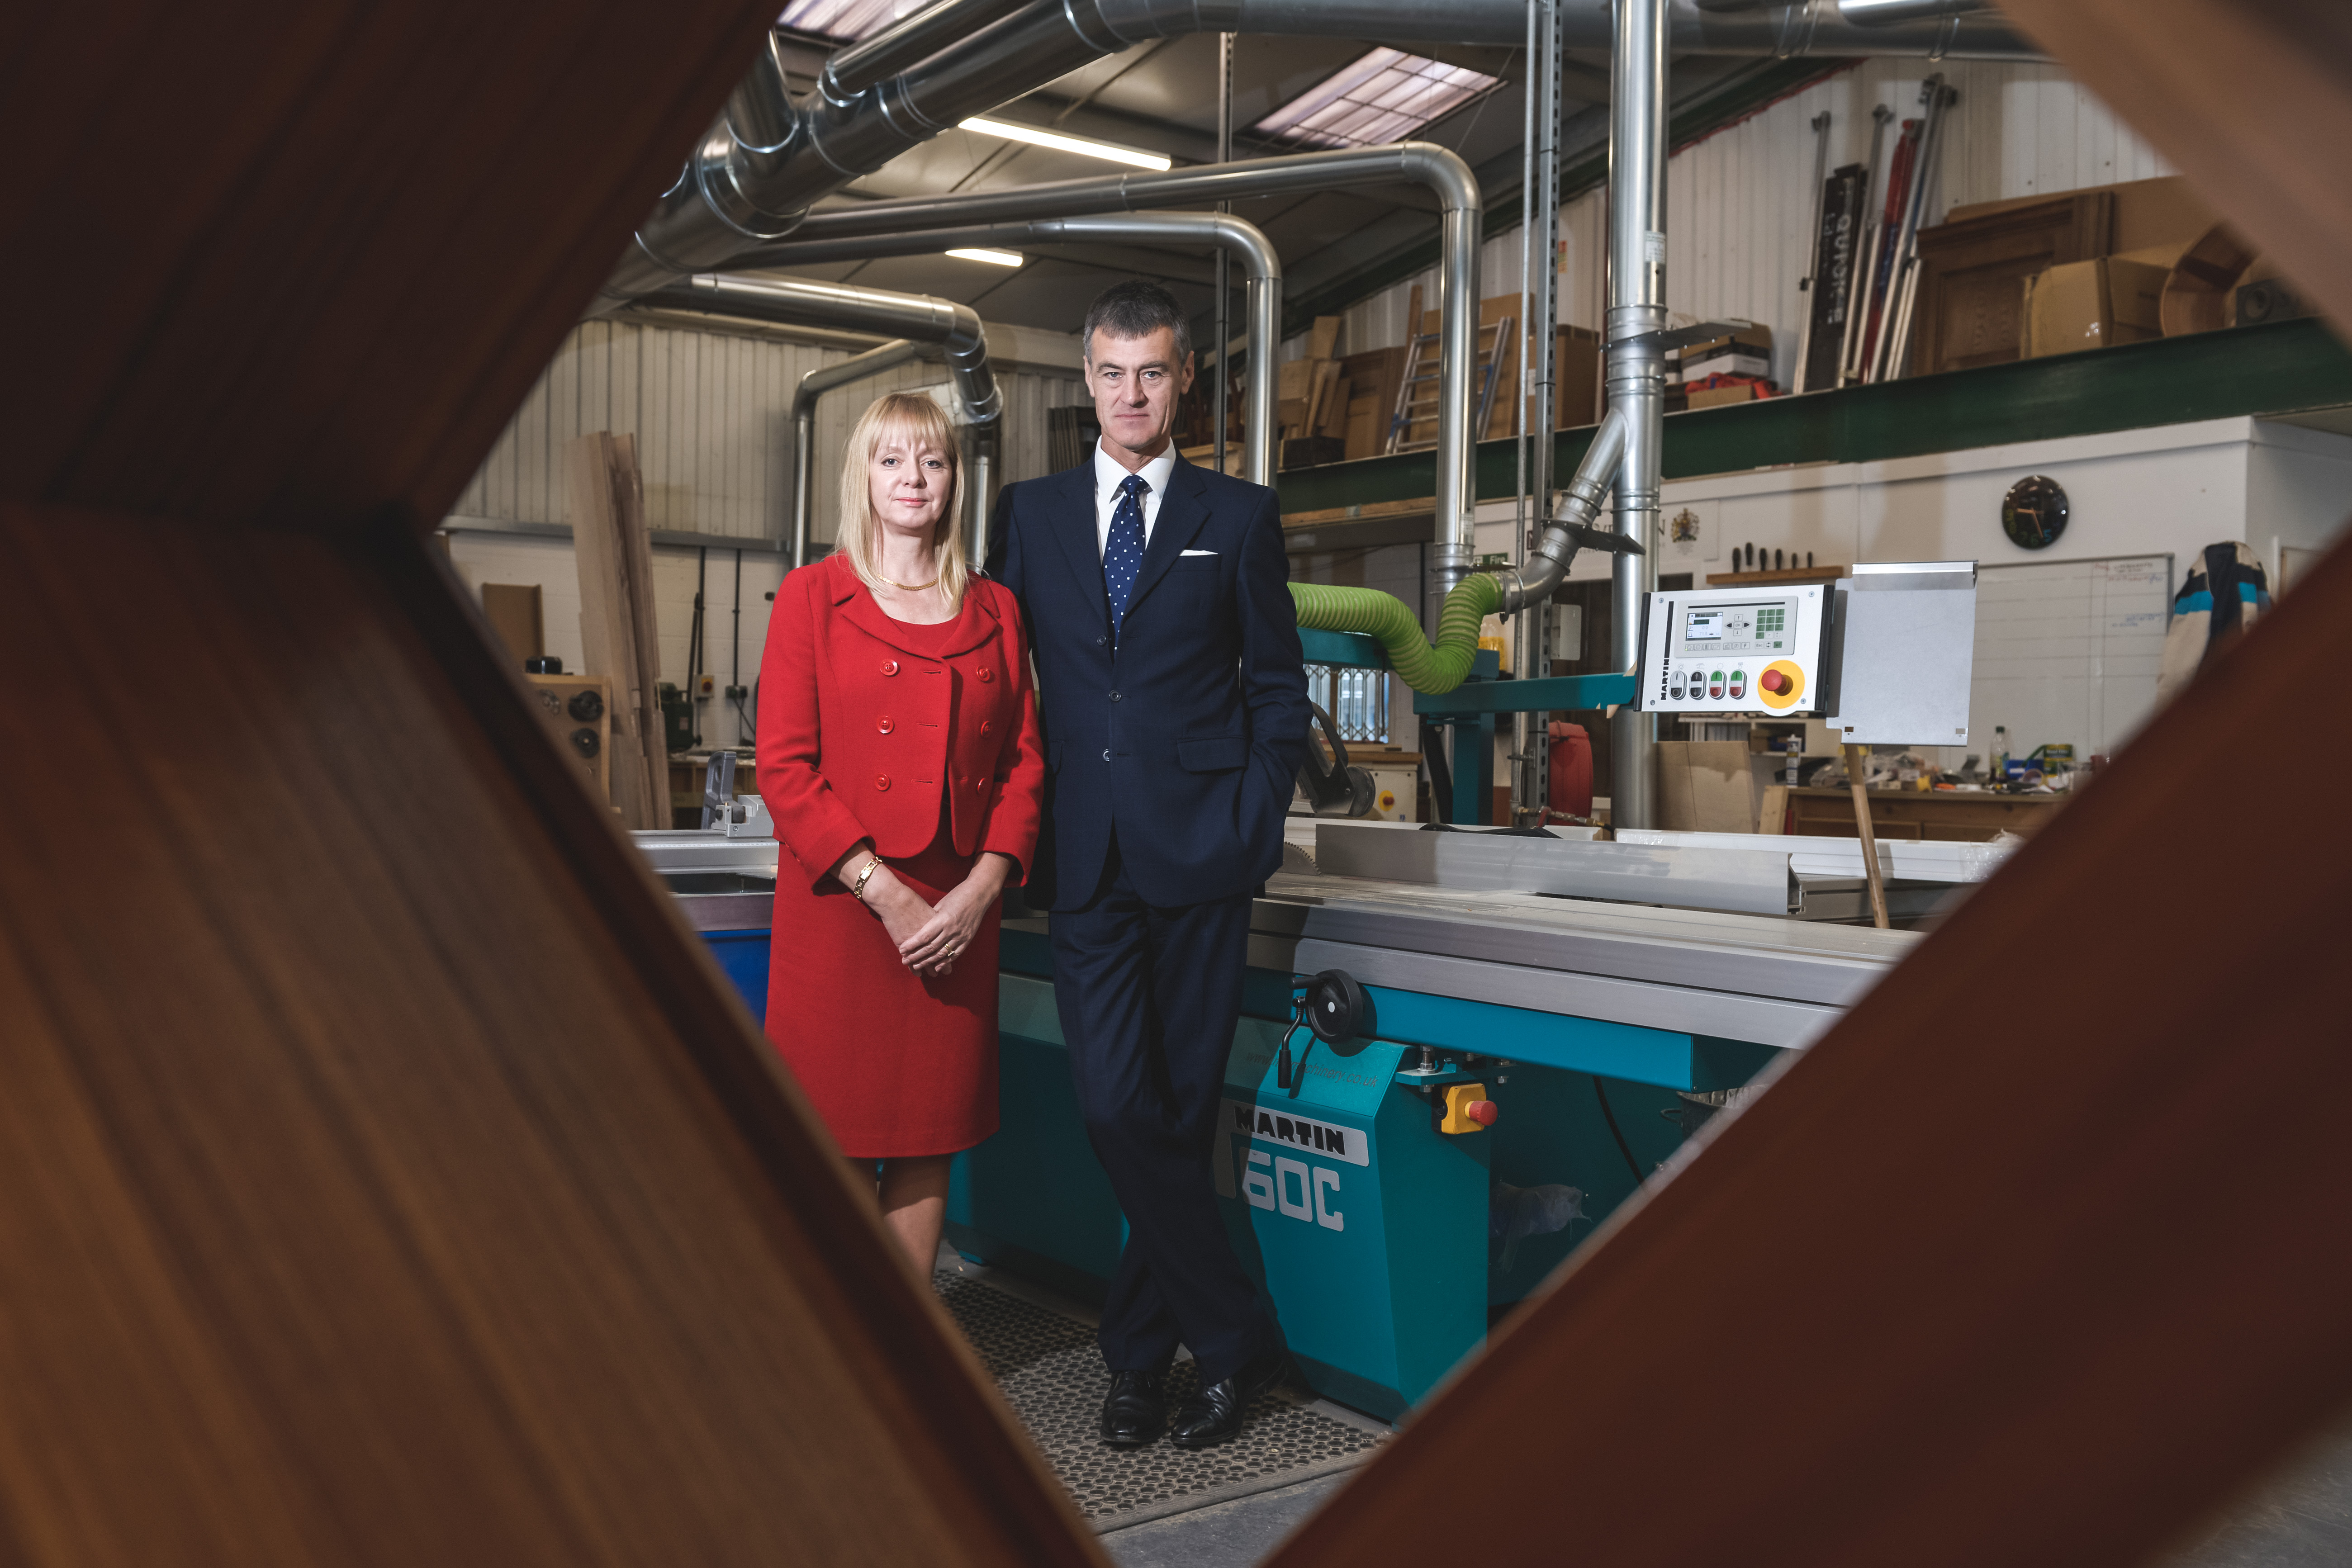 Skilled manufacturer makes major investments on the back of support